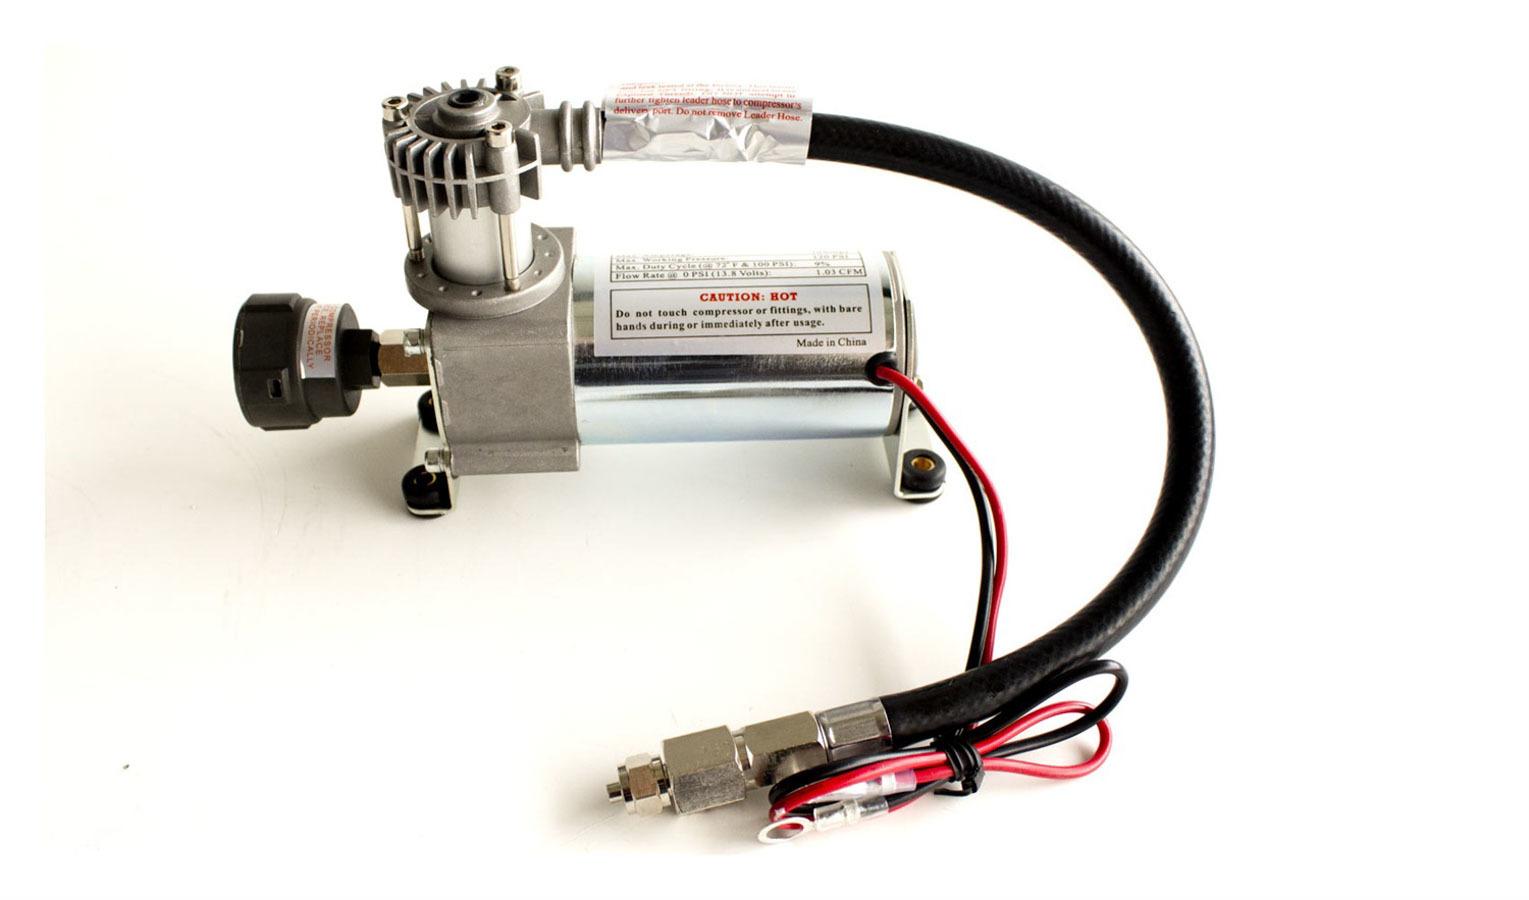 Air Lift 16092 Air Compressor, Suspension, 120 psi Max, 12V, 1.03 CFM, Natural, Air Lift System, Each